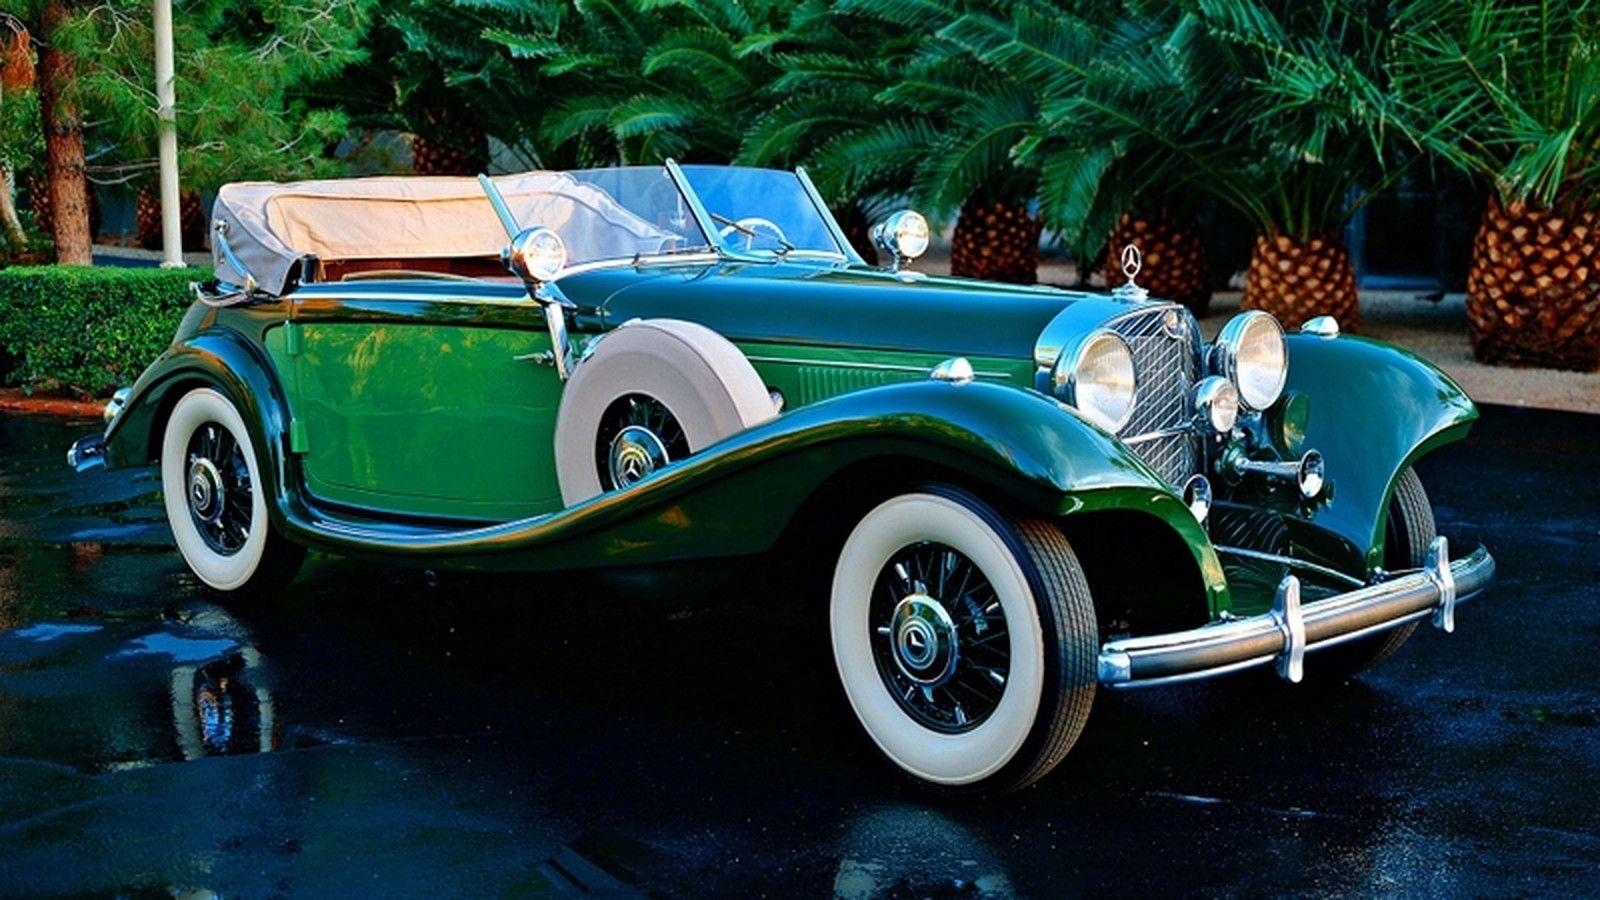 Mercedes Benz - Anyone know what year?   Benz   Pinterest   Benz ...